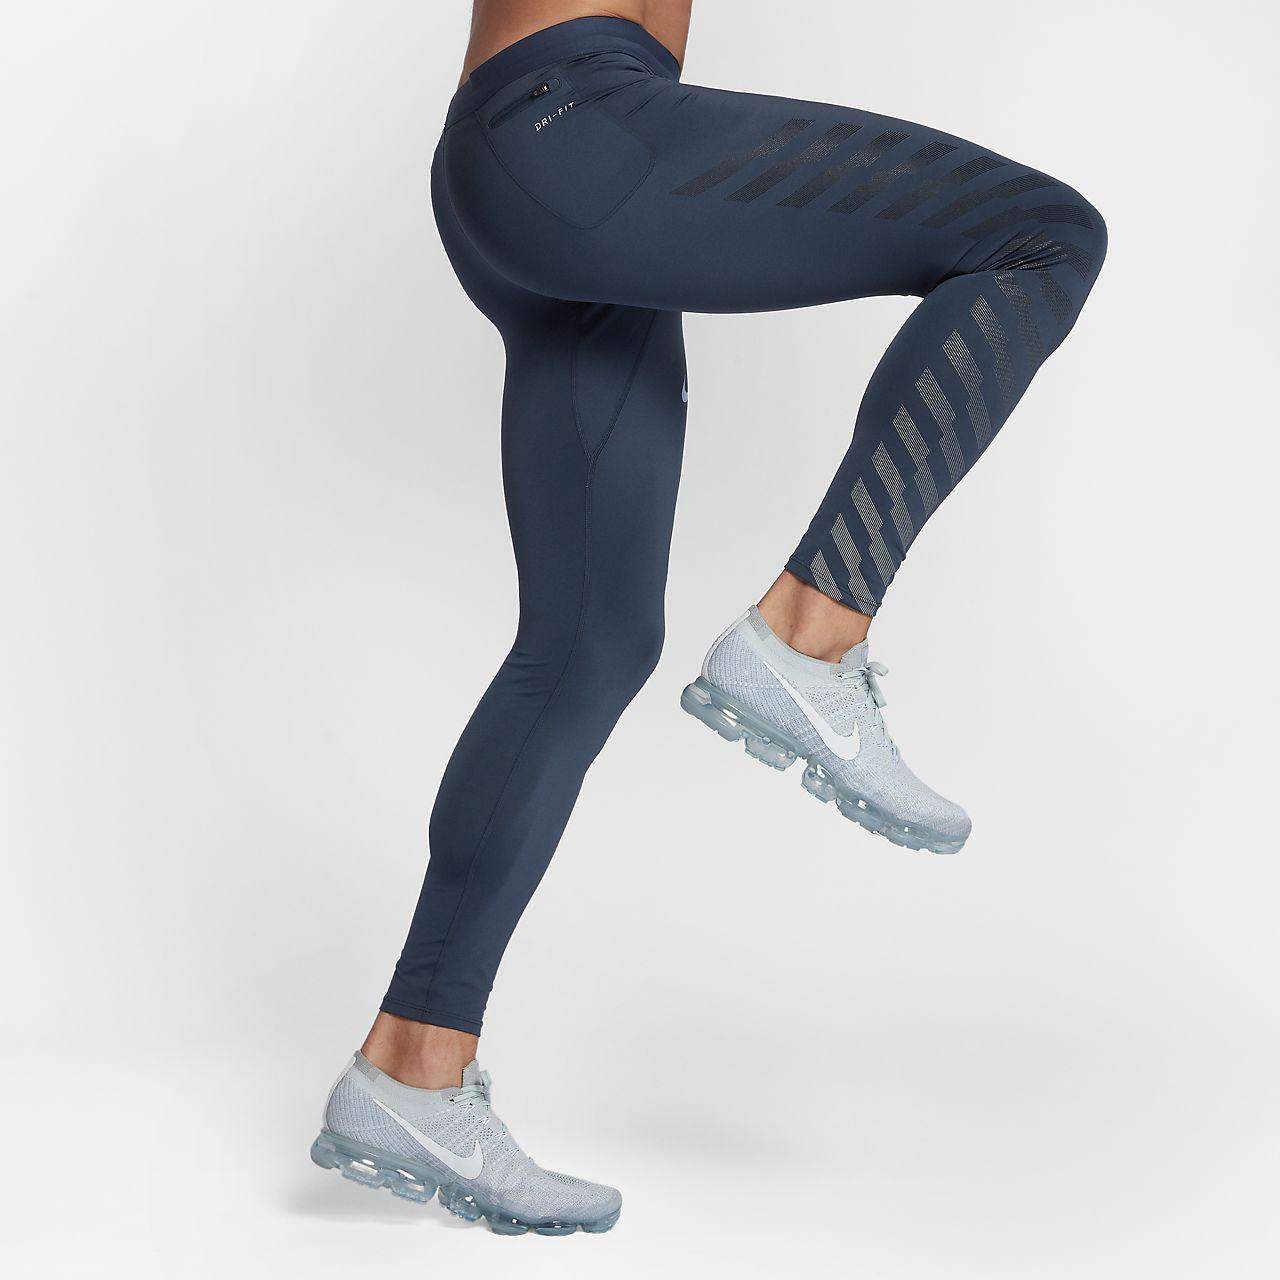 ... Nike Tech Flash Herren-Lauftights mit Grafik